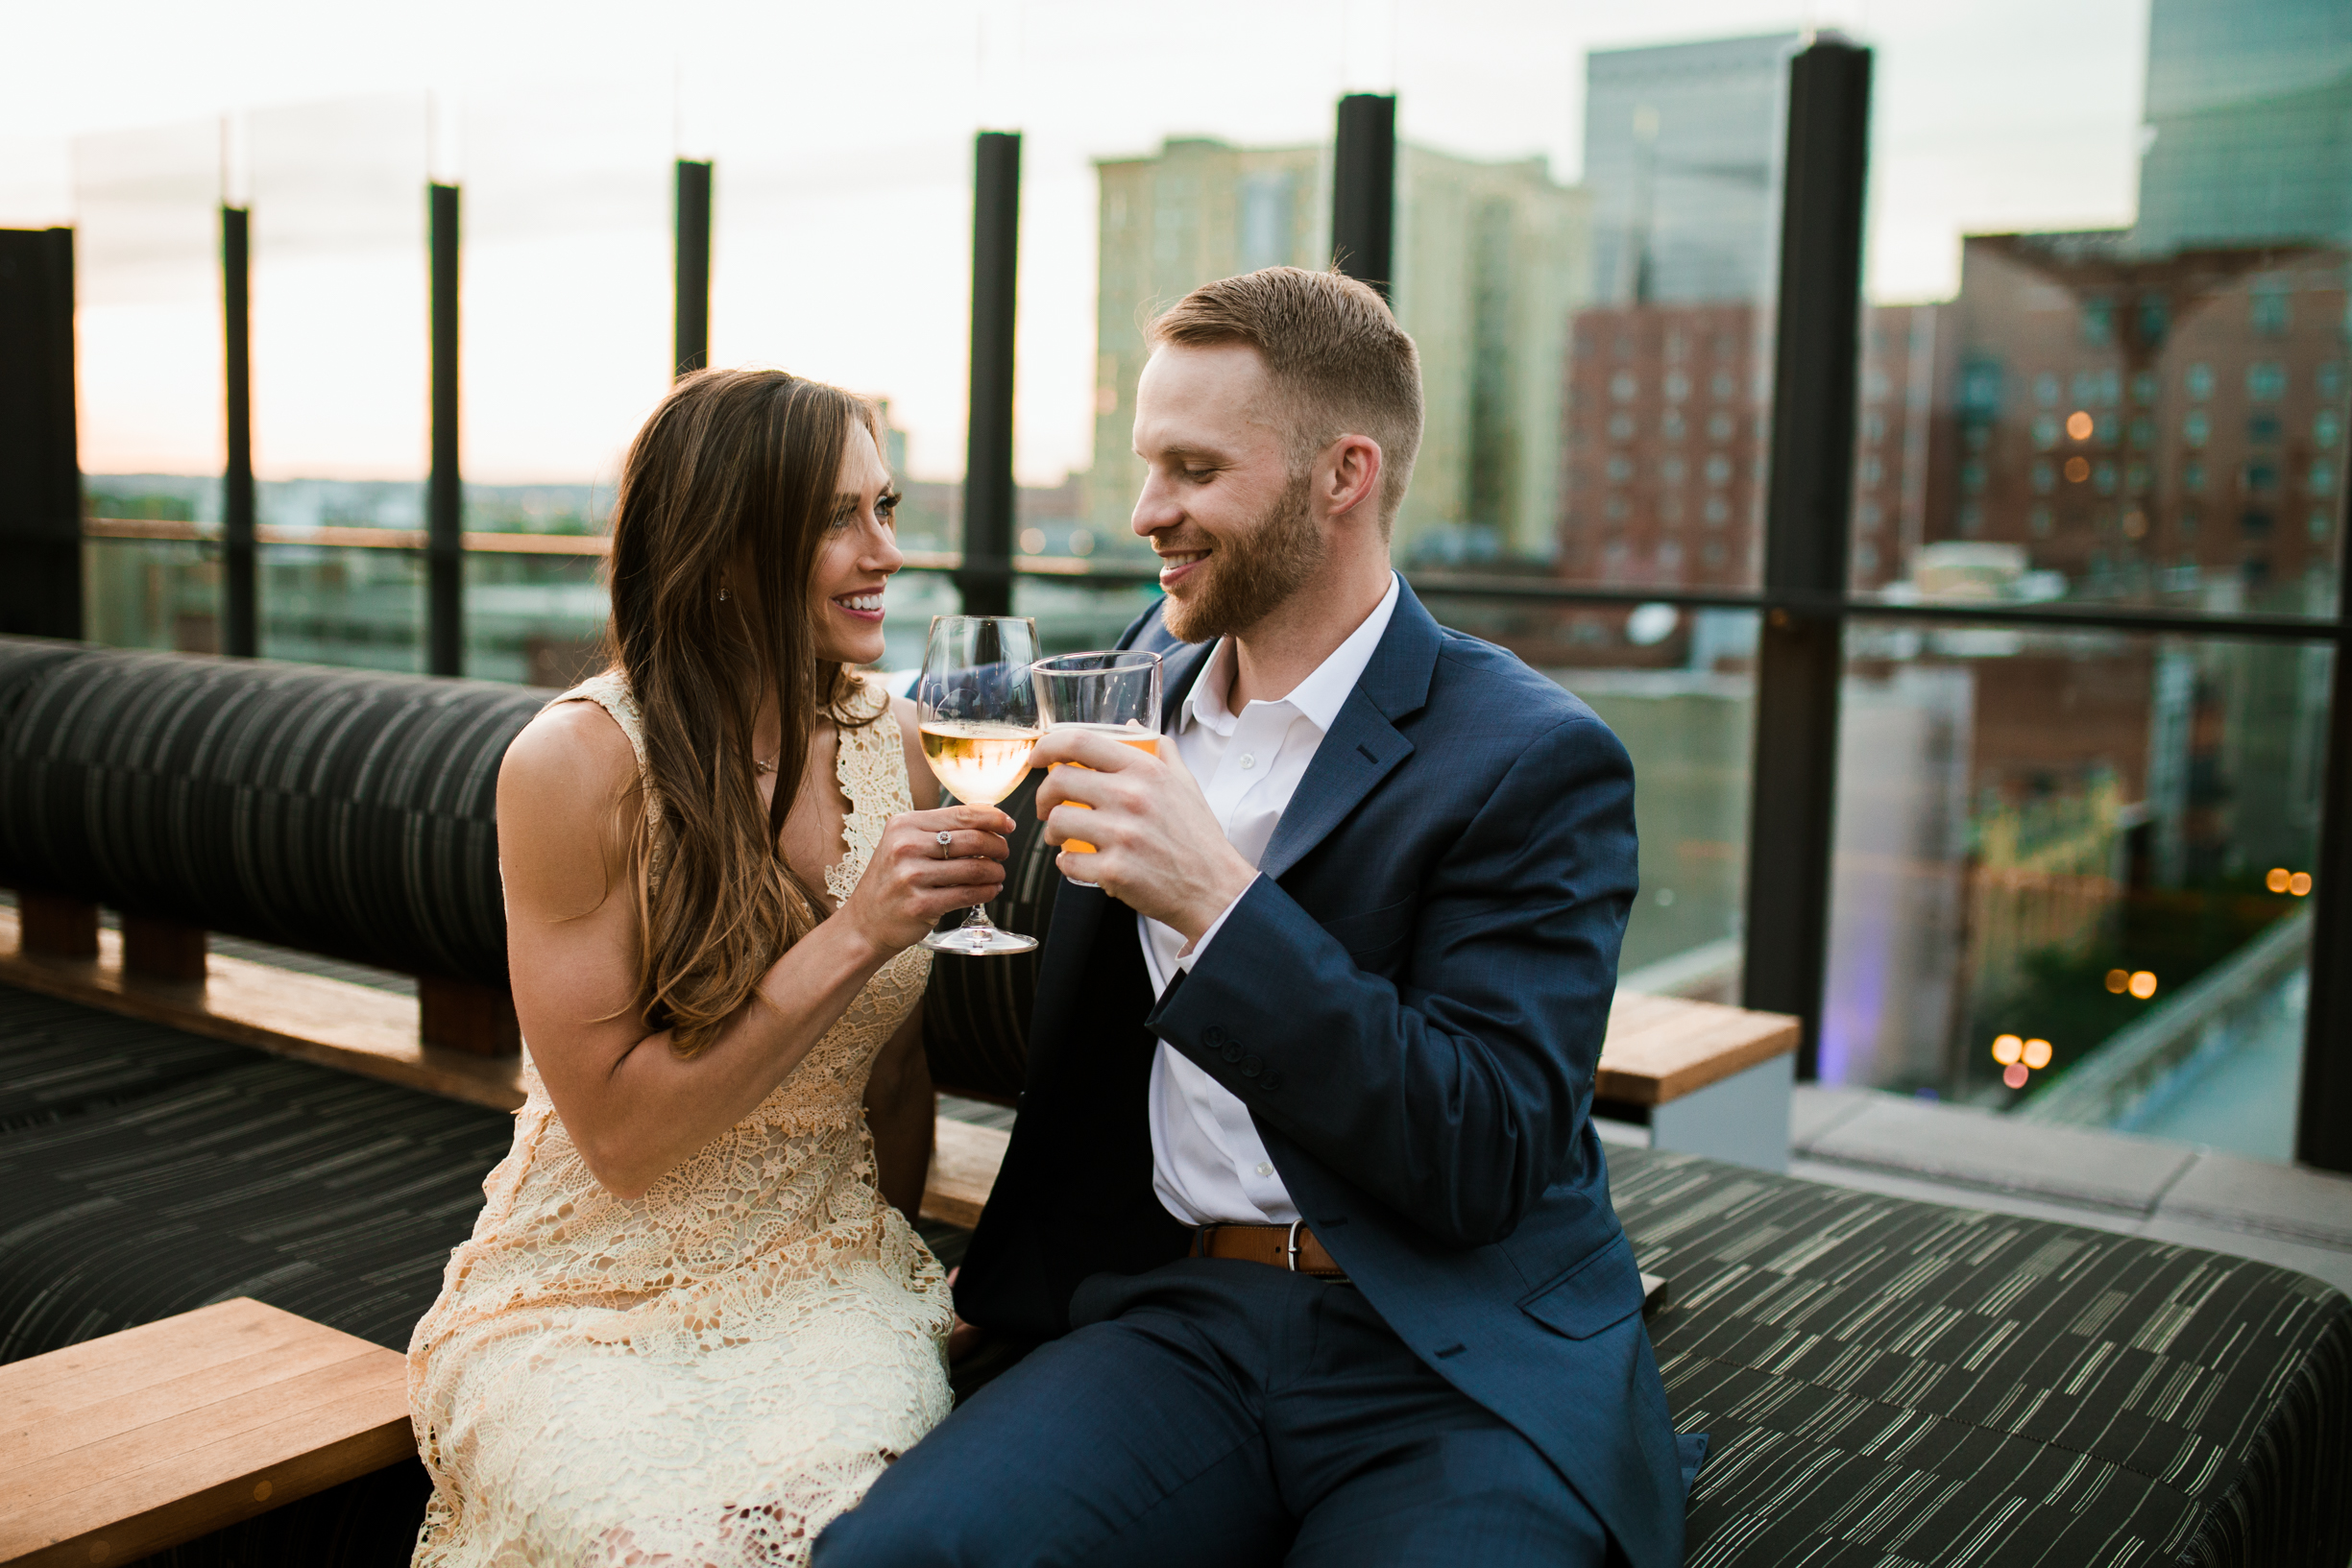 Victoria & Chad Engagement 2018 Crystal Ludwick Photo Louisville Kentucky Wedding Photographer WEBSITE (12 of 48).jpg